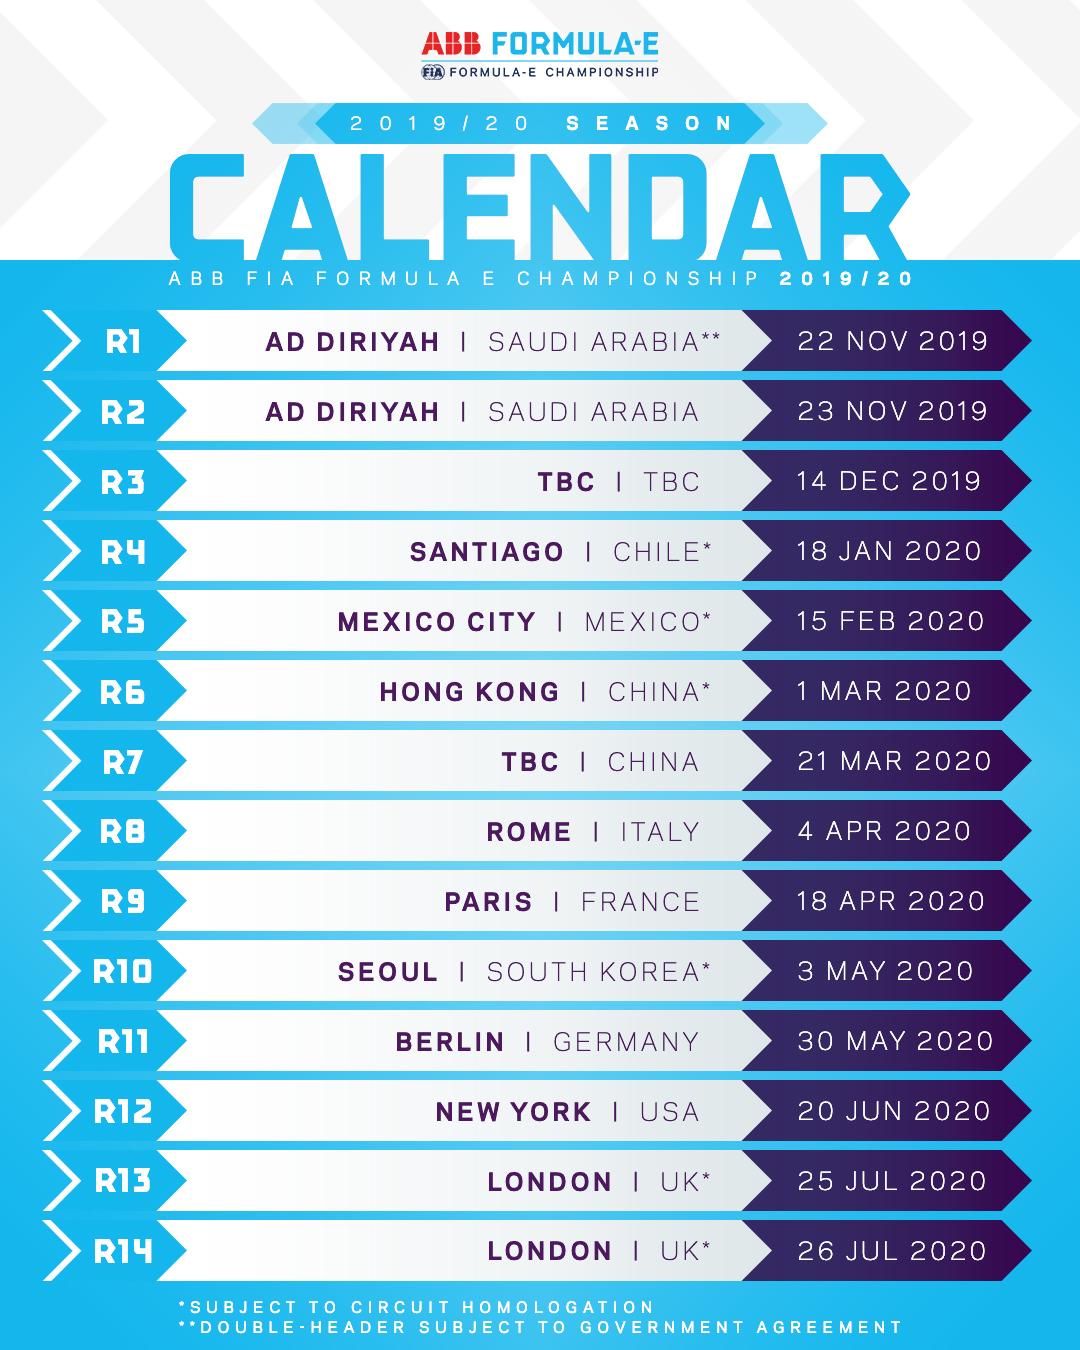 Neel Jani official page | FIA Releases 2019/2020 Formula E Calendar